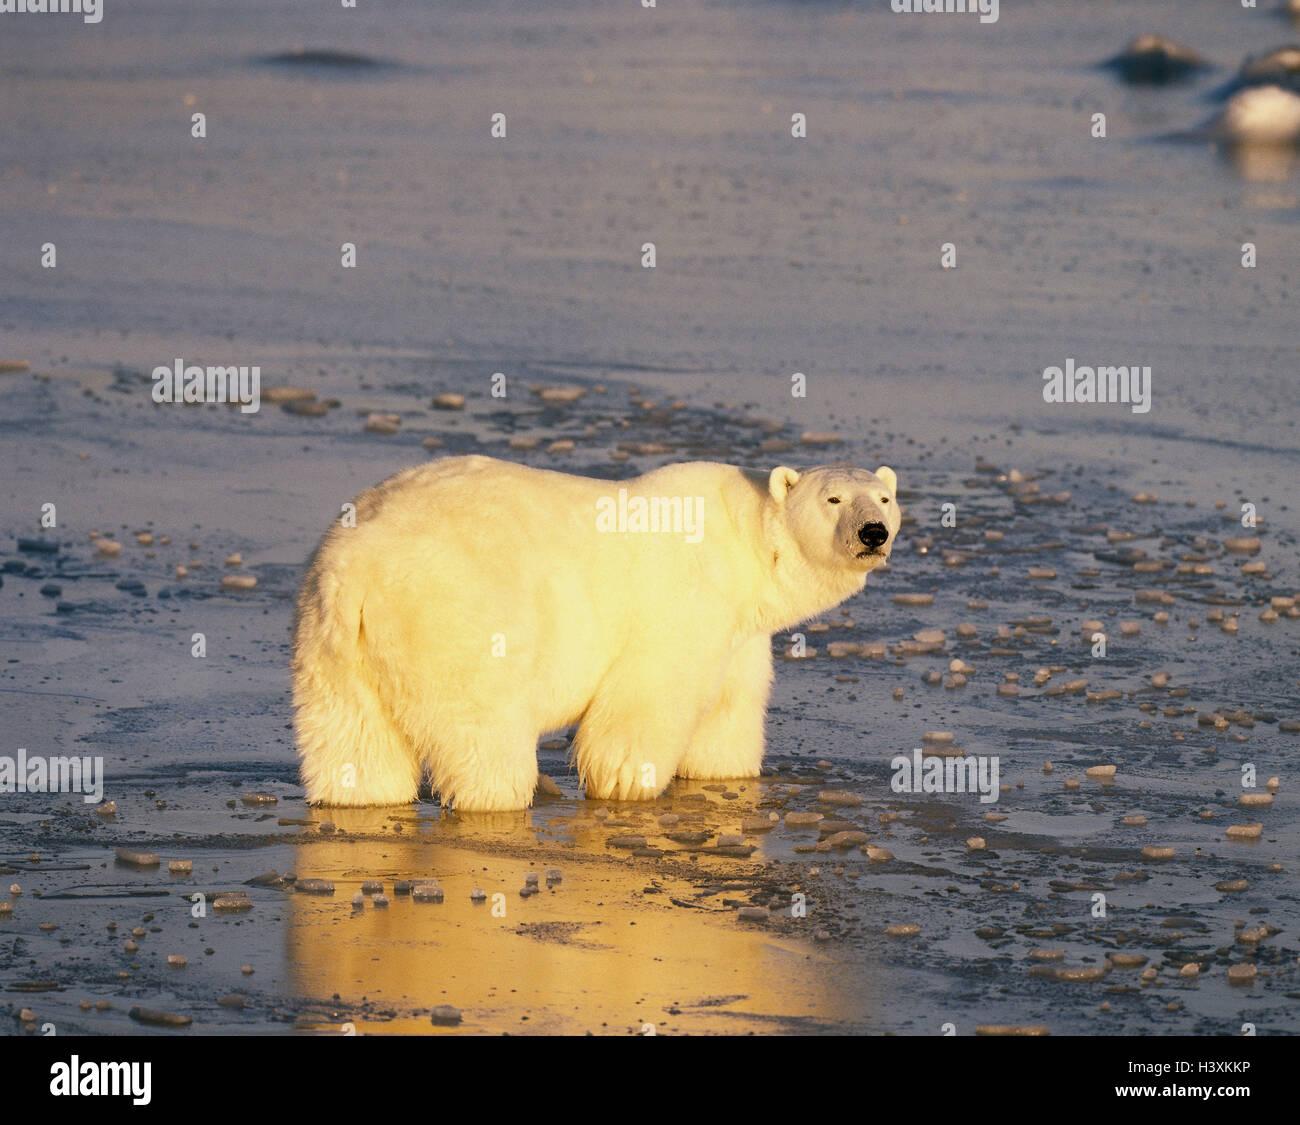 Canada, polar bear, Thalarctos maritimus, Hudson Bay, nature, scenery, animal, bear, Ursus maritimus, freedom, wild - Stock Image